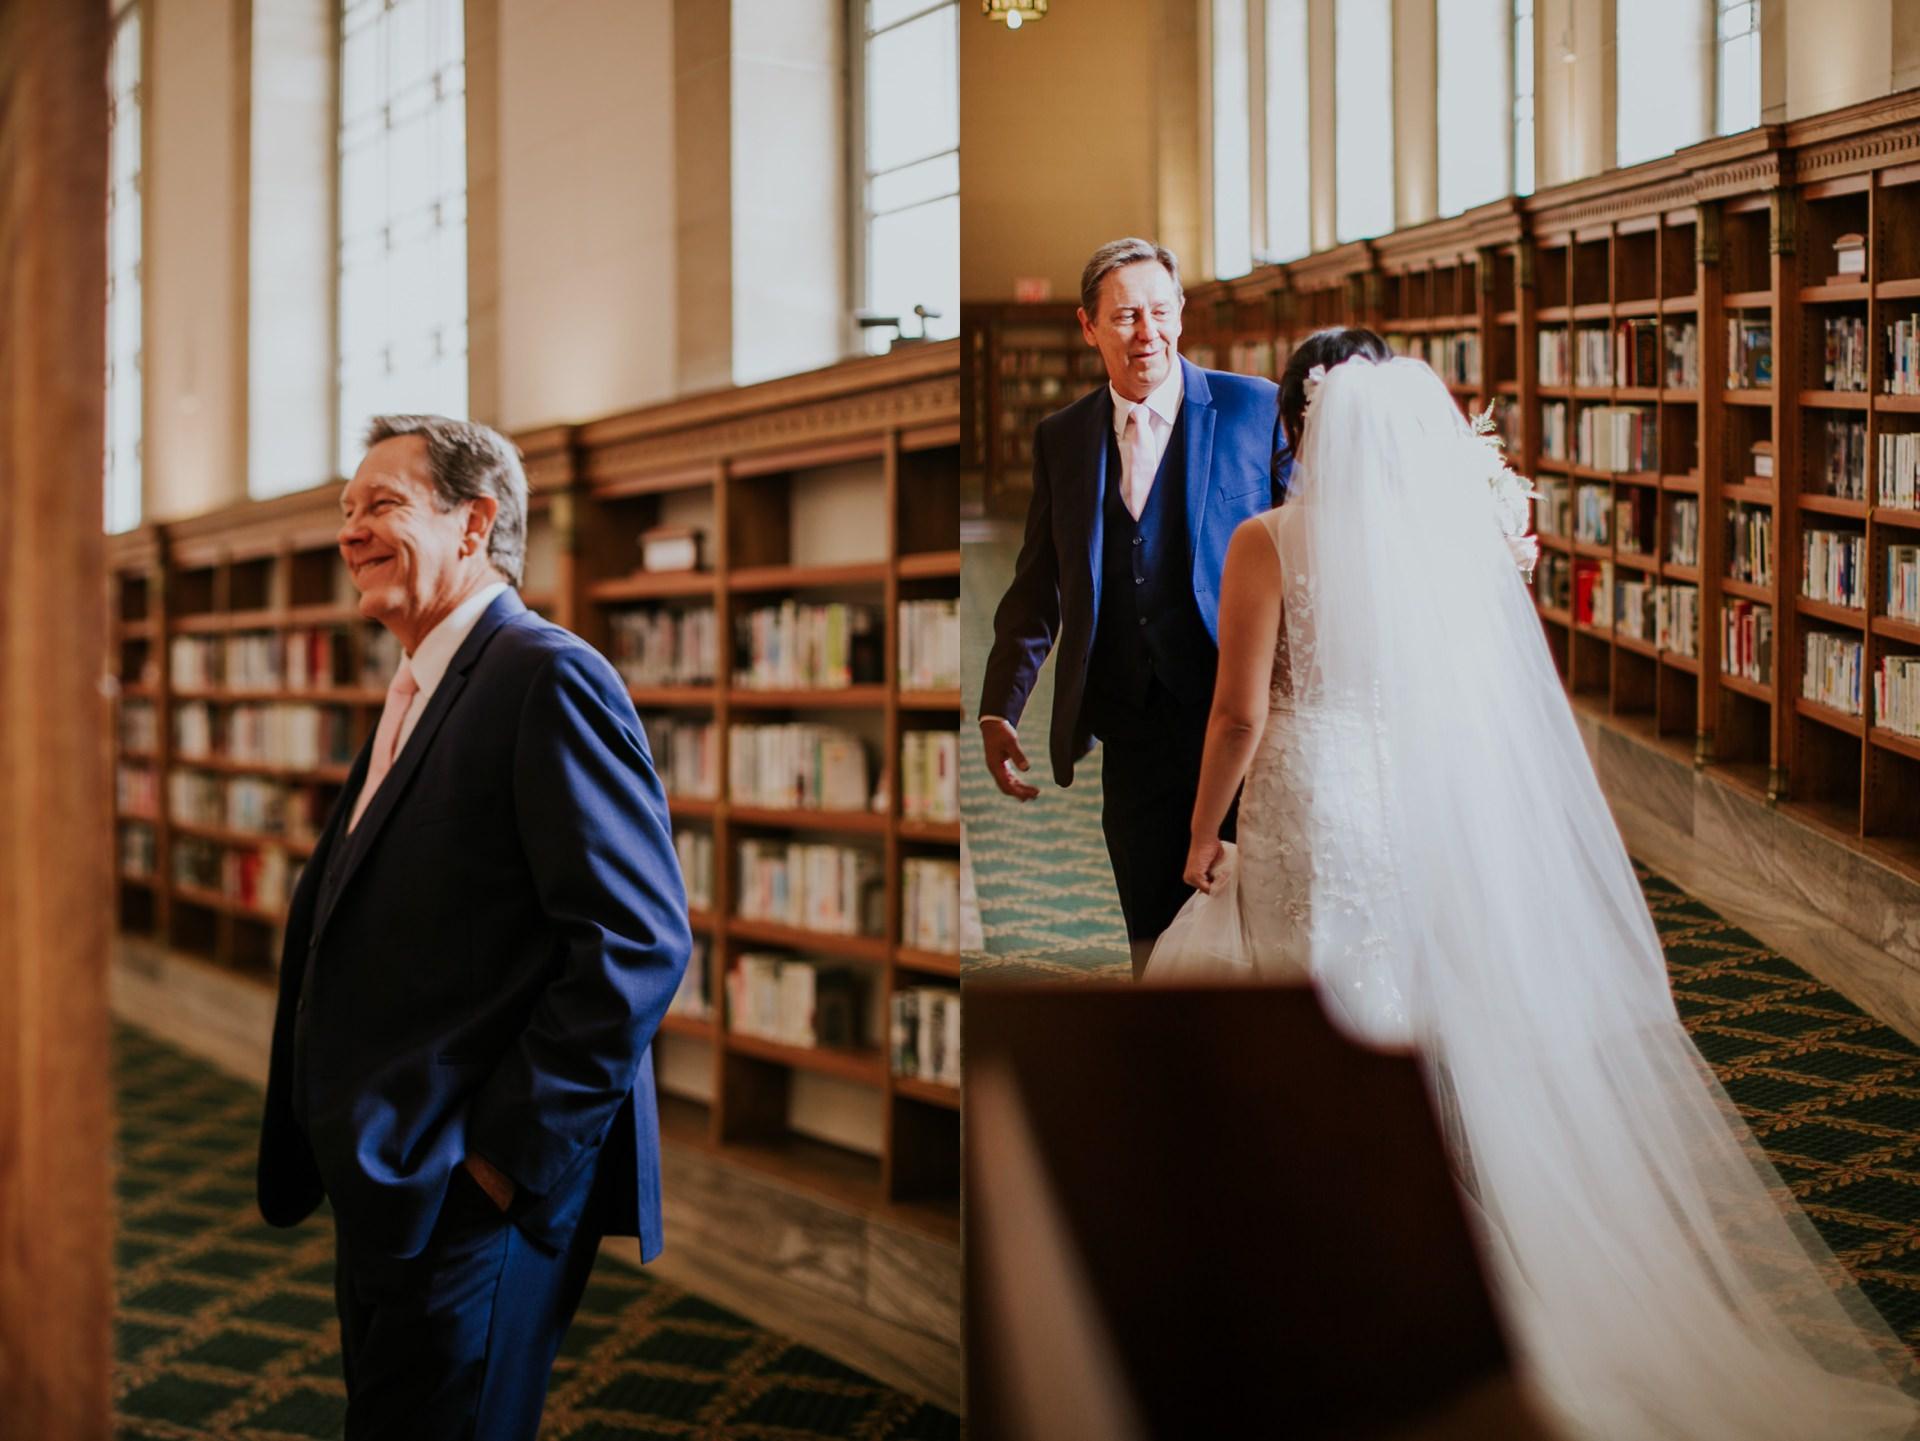 Indianapolis-Public-Library-Wedding_026.jpg